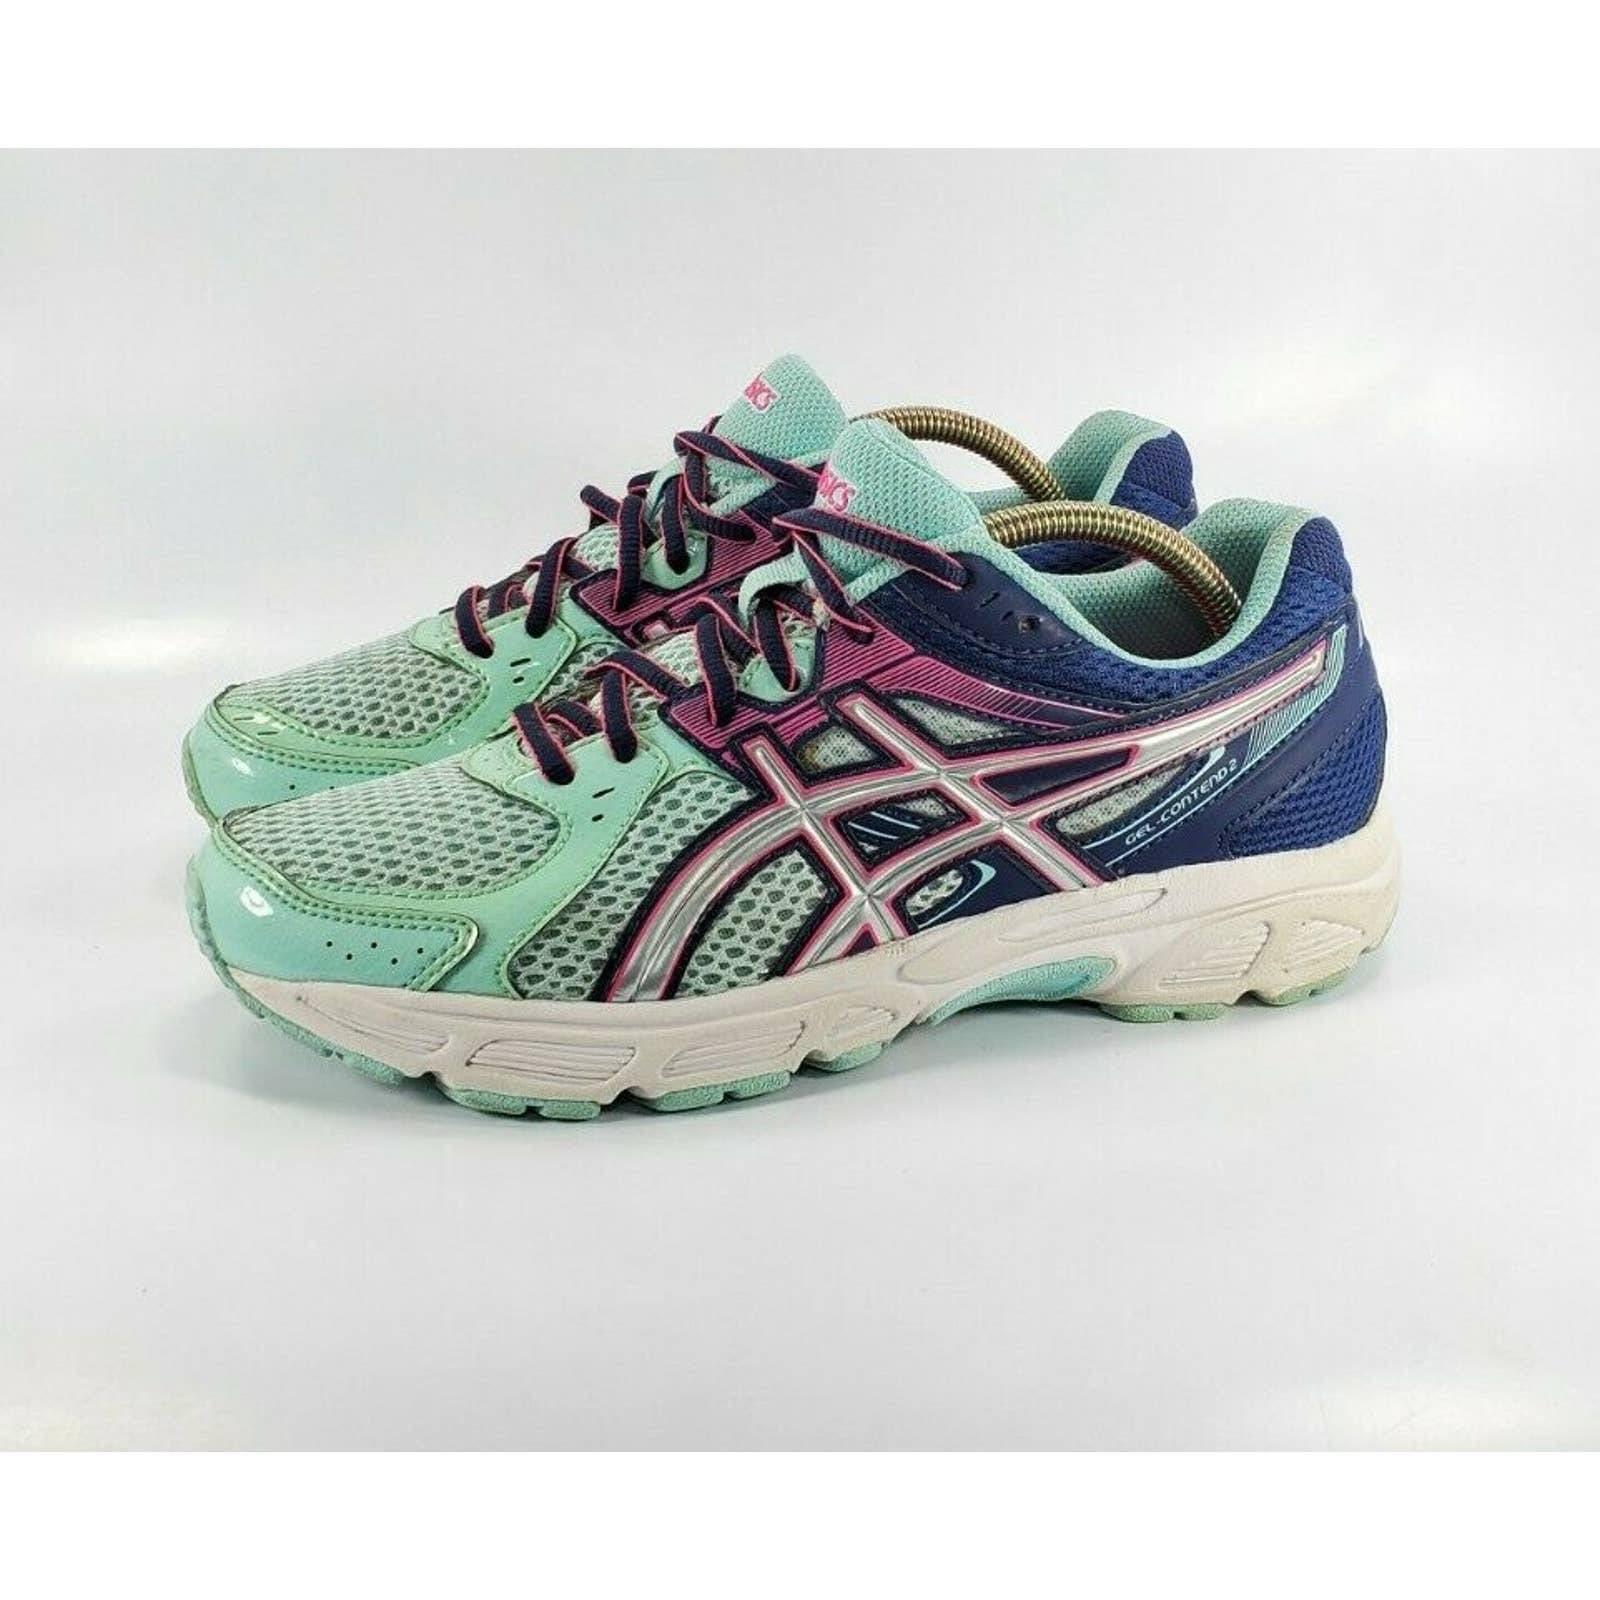 ASICS Gel Contend 2 Running Trainer Shoe